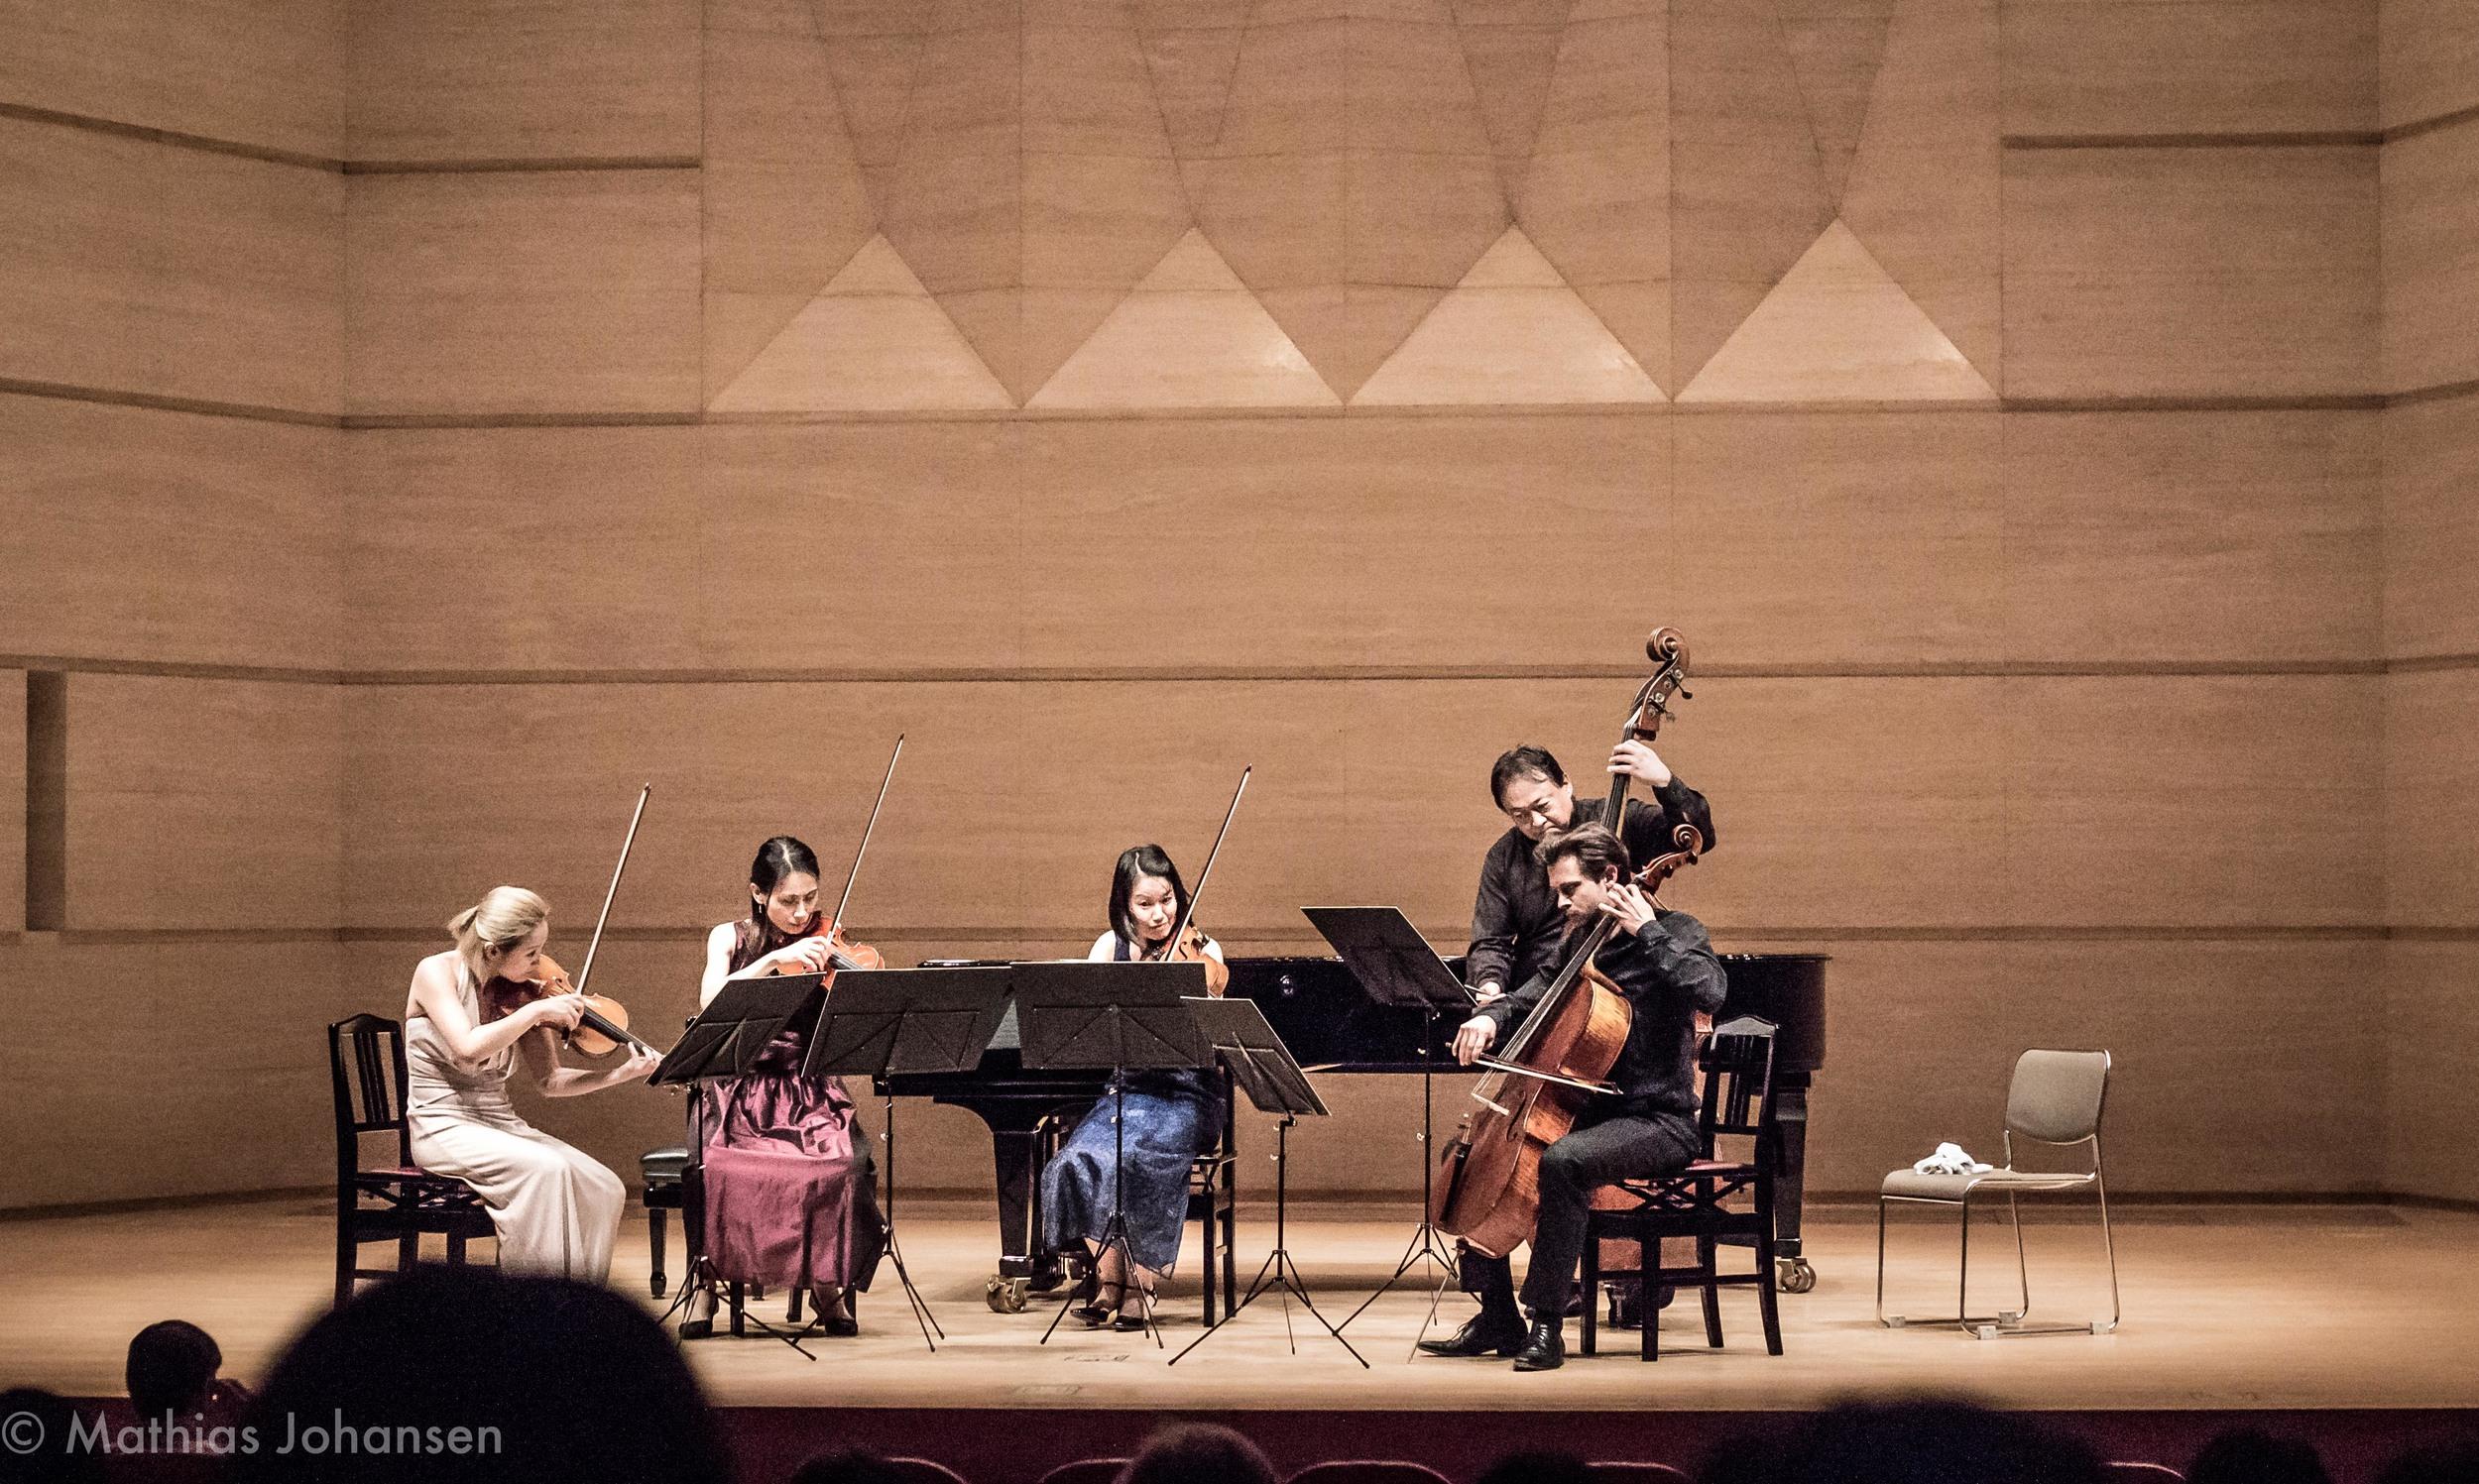 Masters concert in Nagoya - Wassermusik